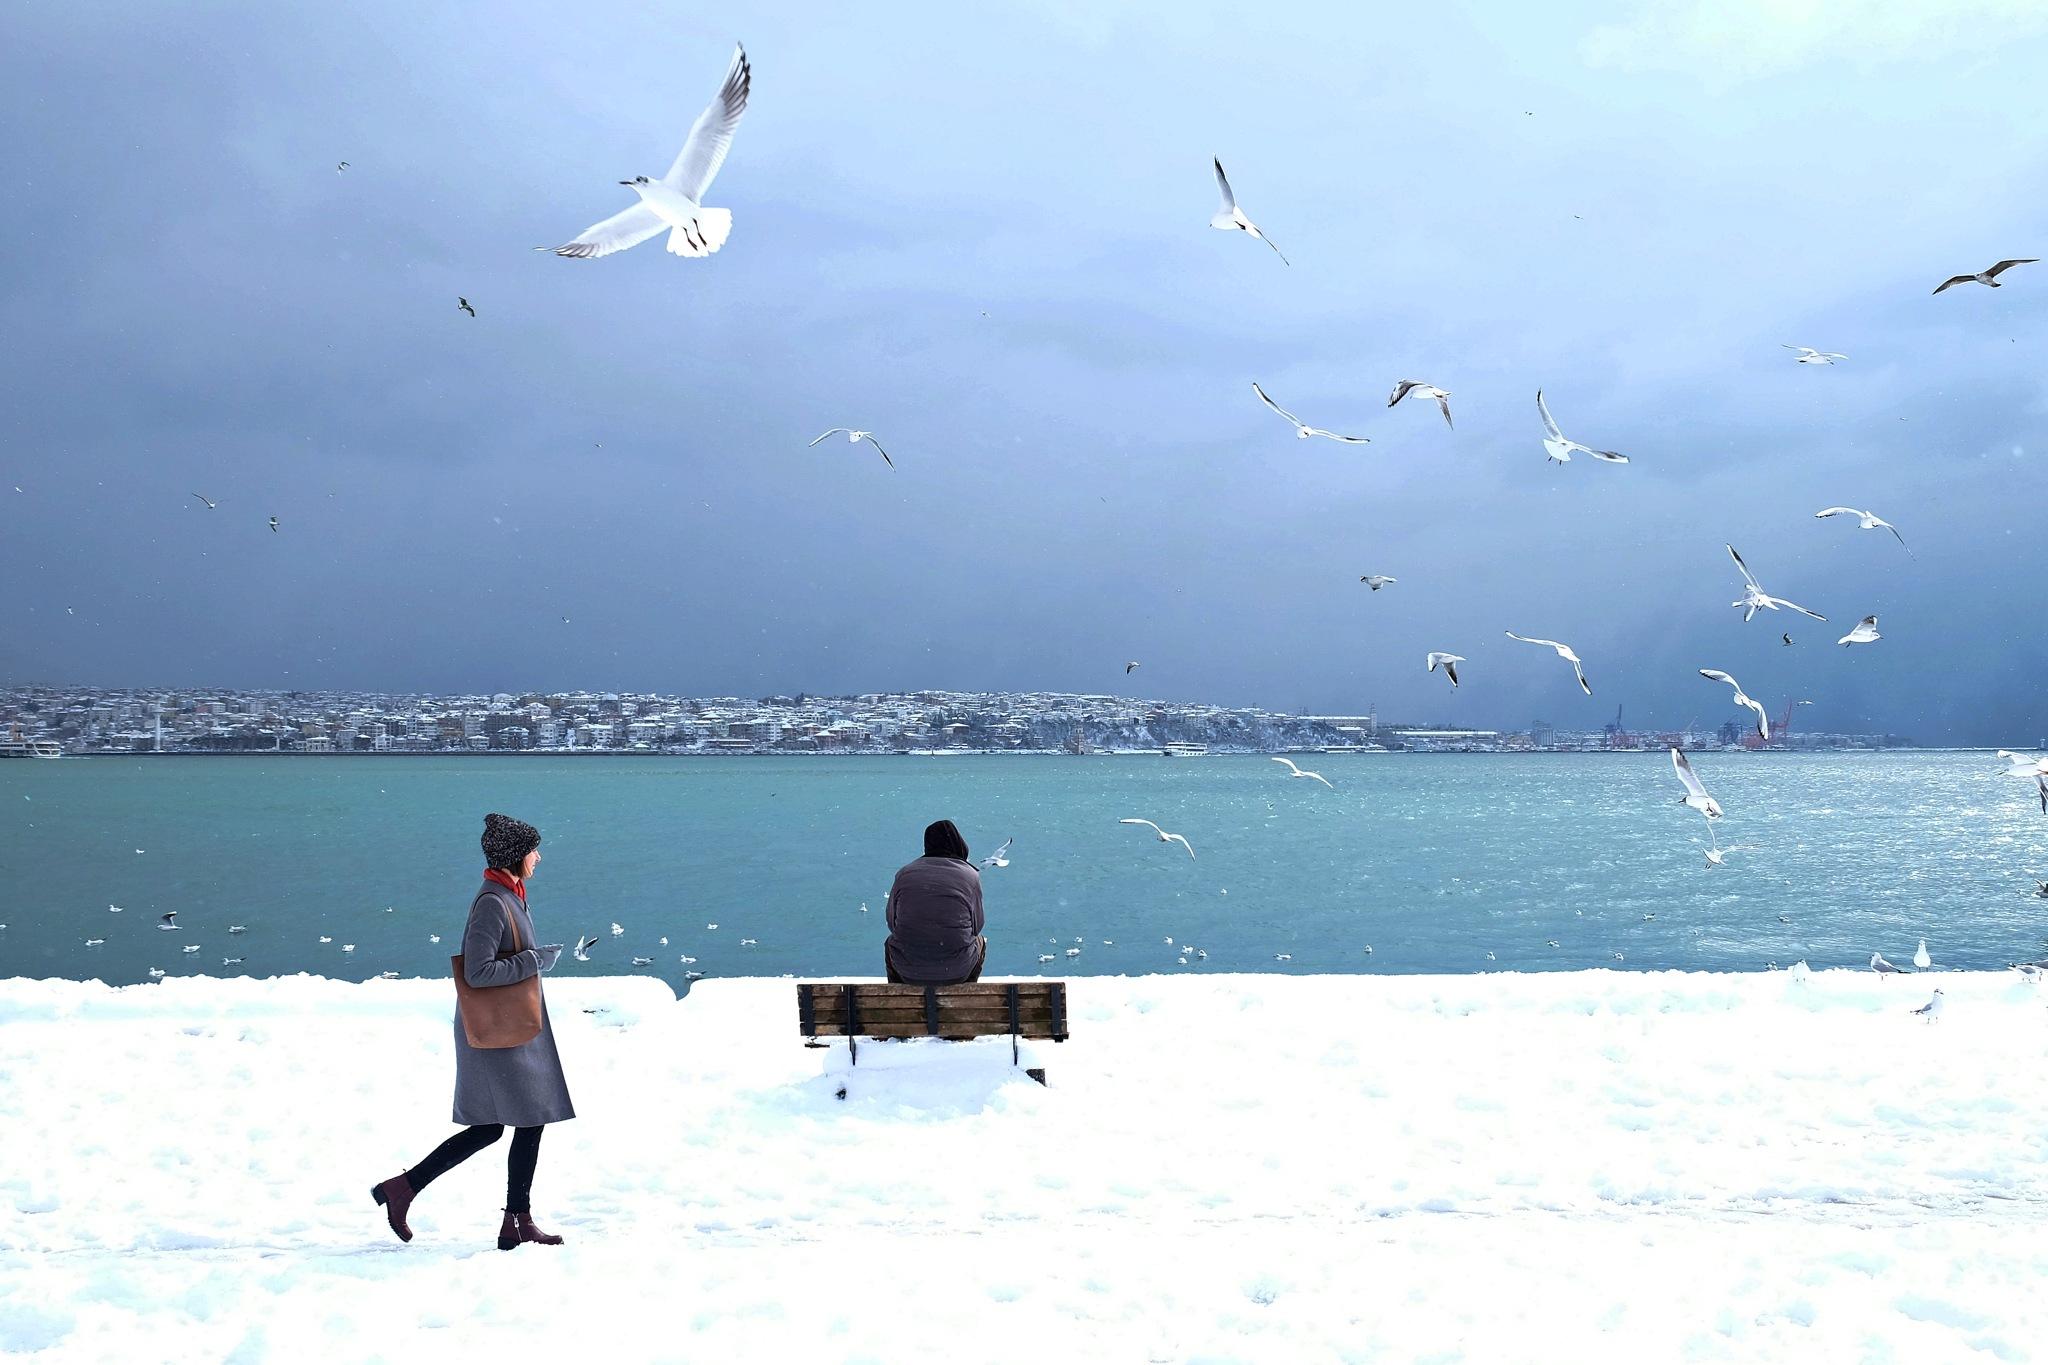 Istanbul by Eren Cevik